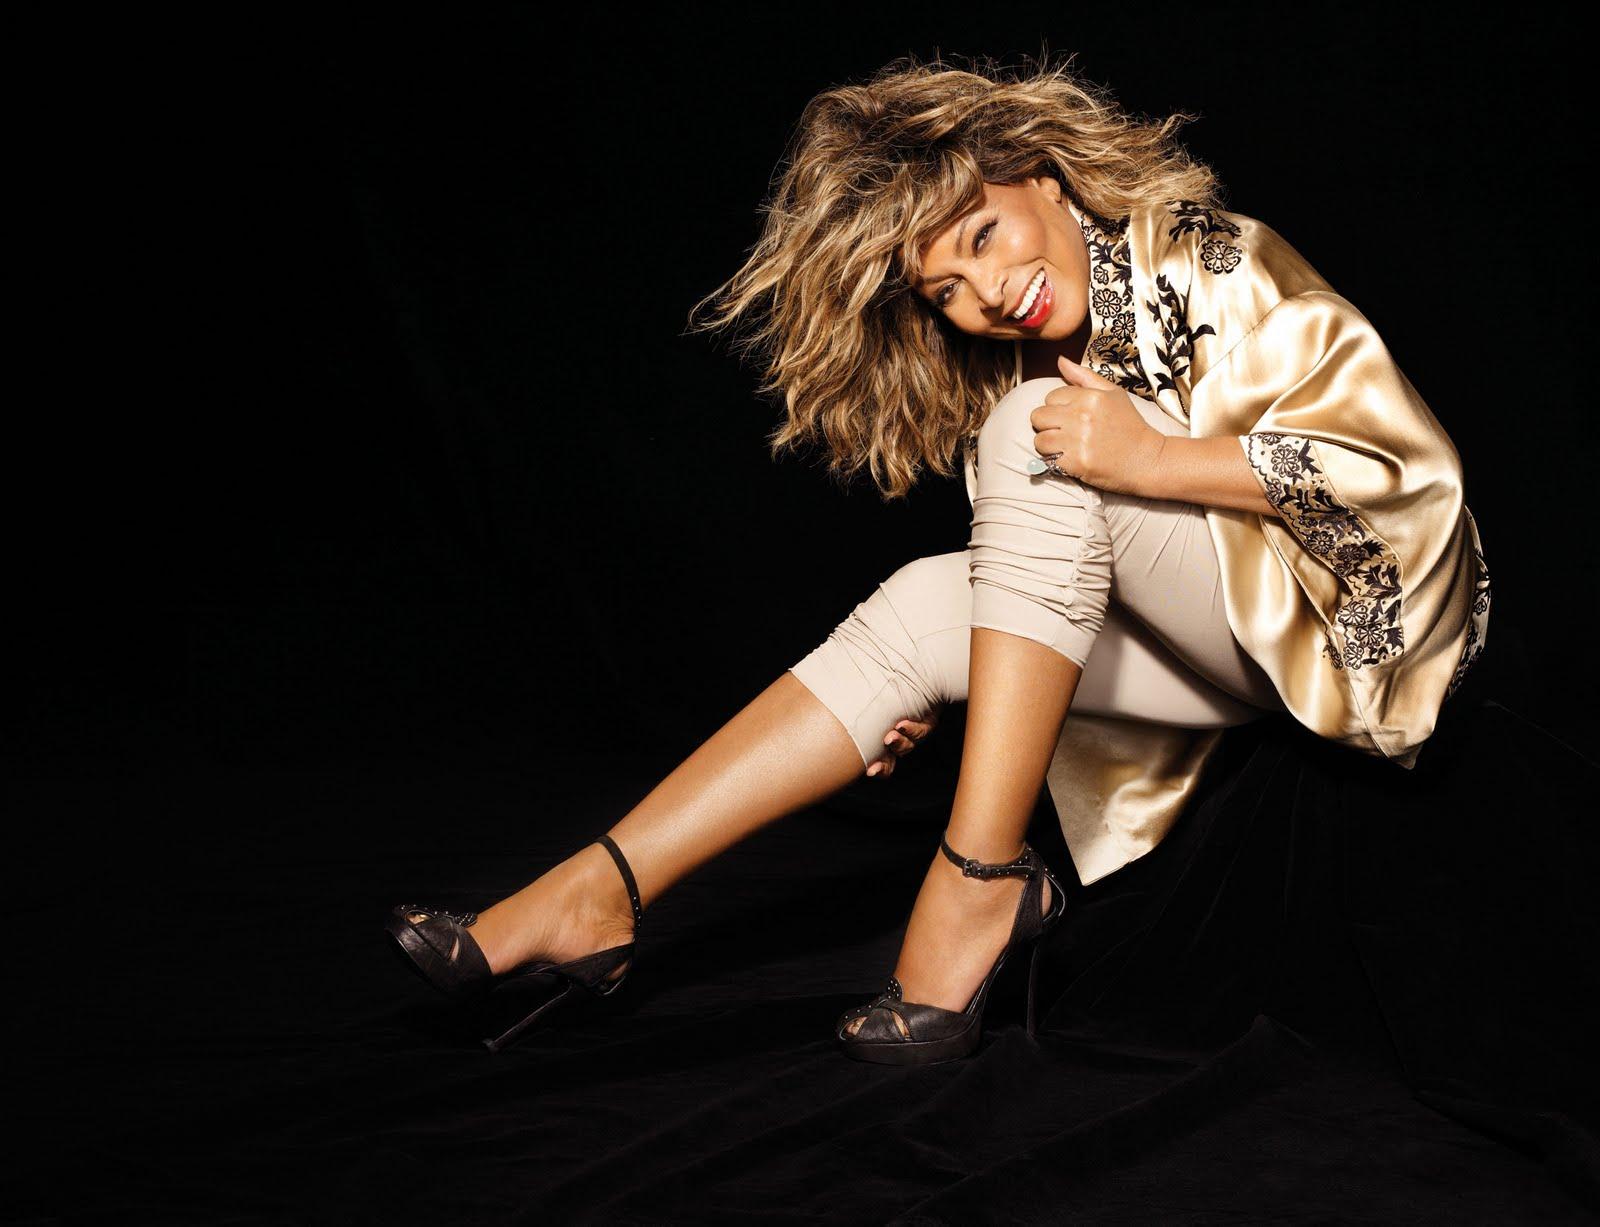 http://4.bp.blogspot.com/_Gx5cj5vpwoE/S64thmzFPYI/AAAAAAAAABE/n8zTxNZpp9c/s1600/Tina-Turner-2008_Andrew-Macpherson-4.jpg